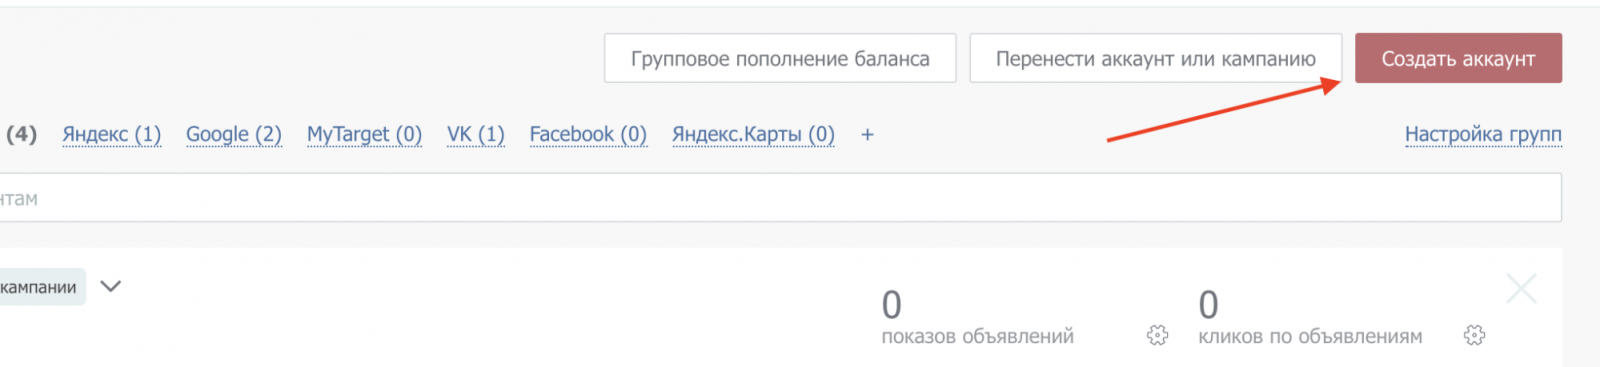 Как добавить аккаунт Яндекс.Карты?